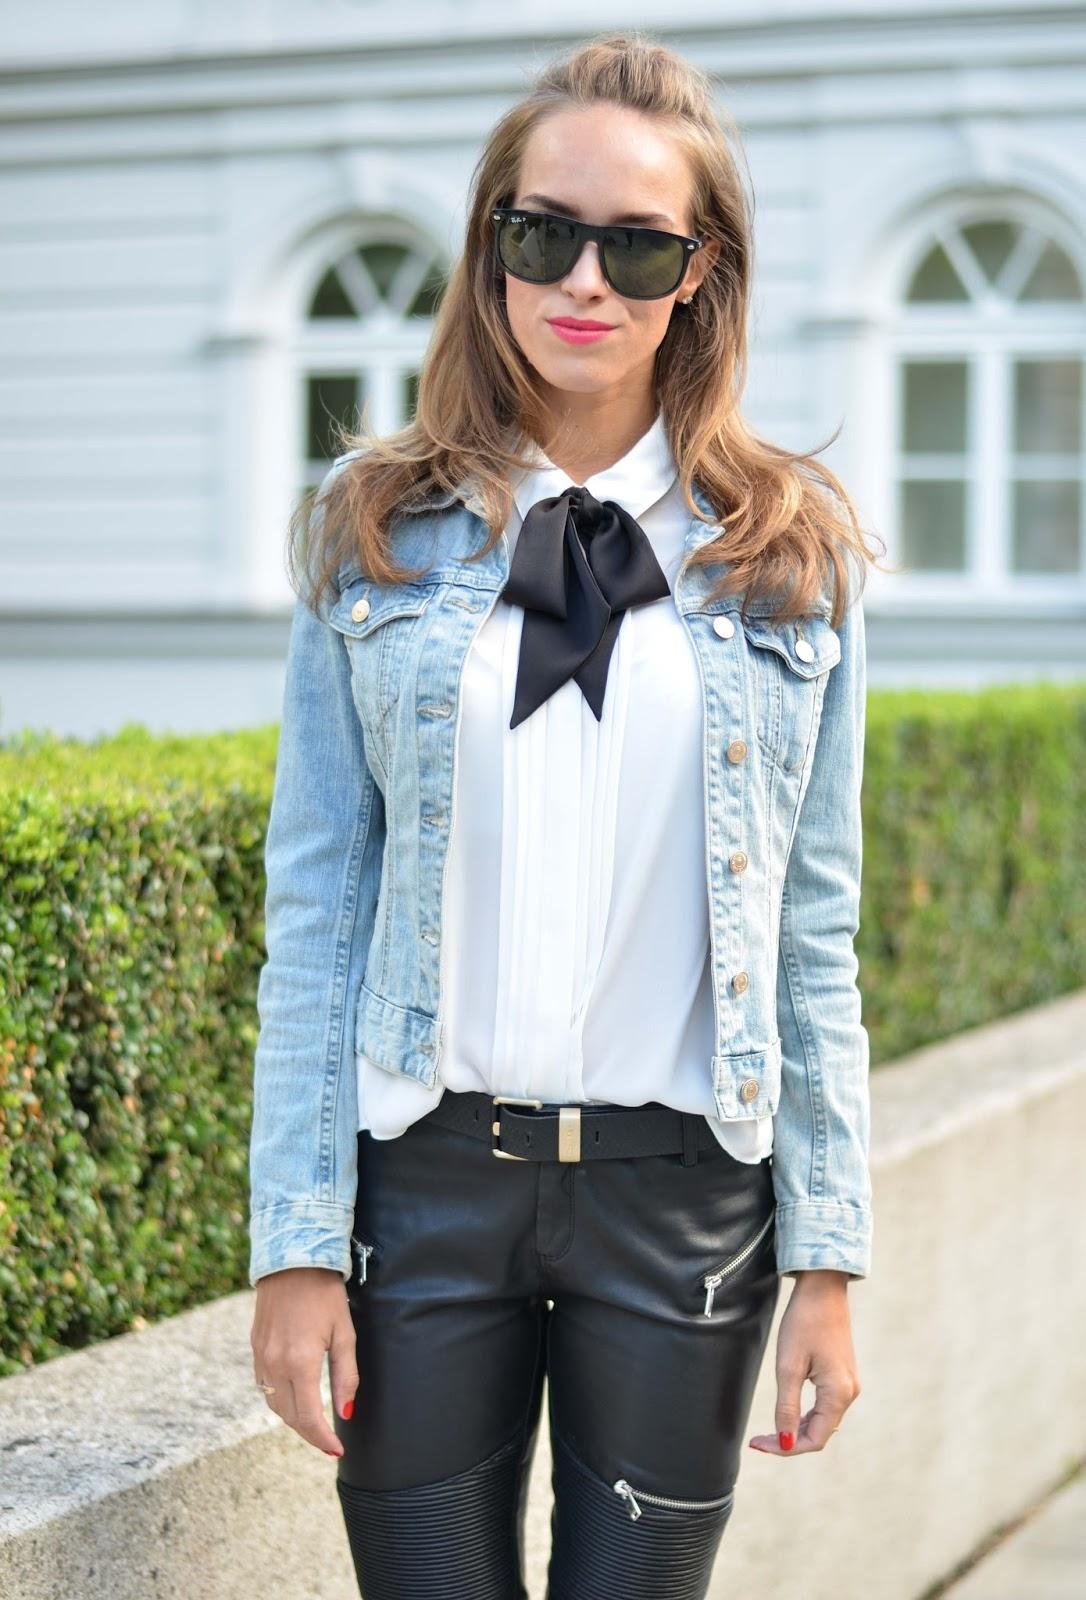 kristjaana mere black bow tie white shirt outfit